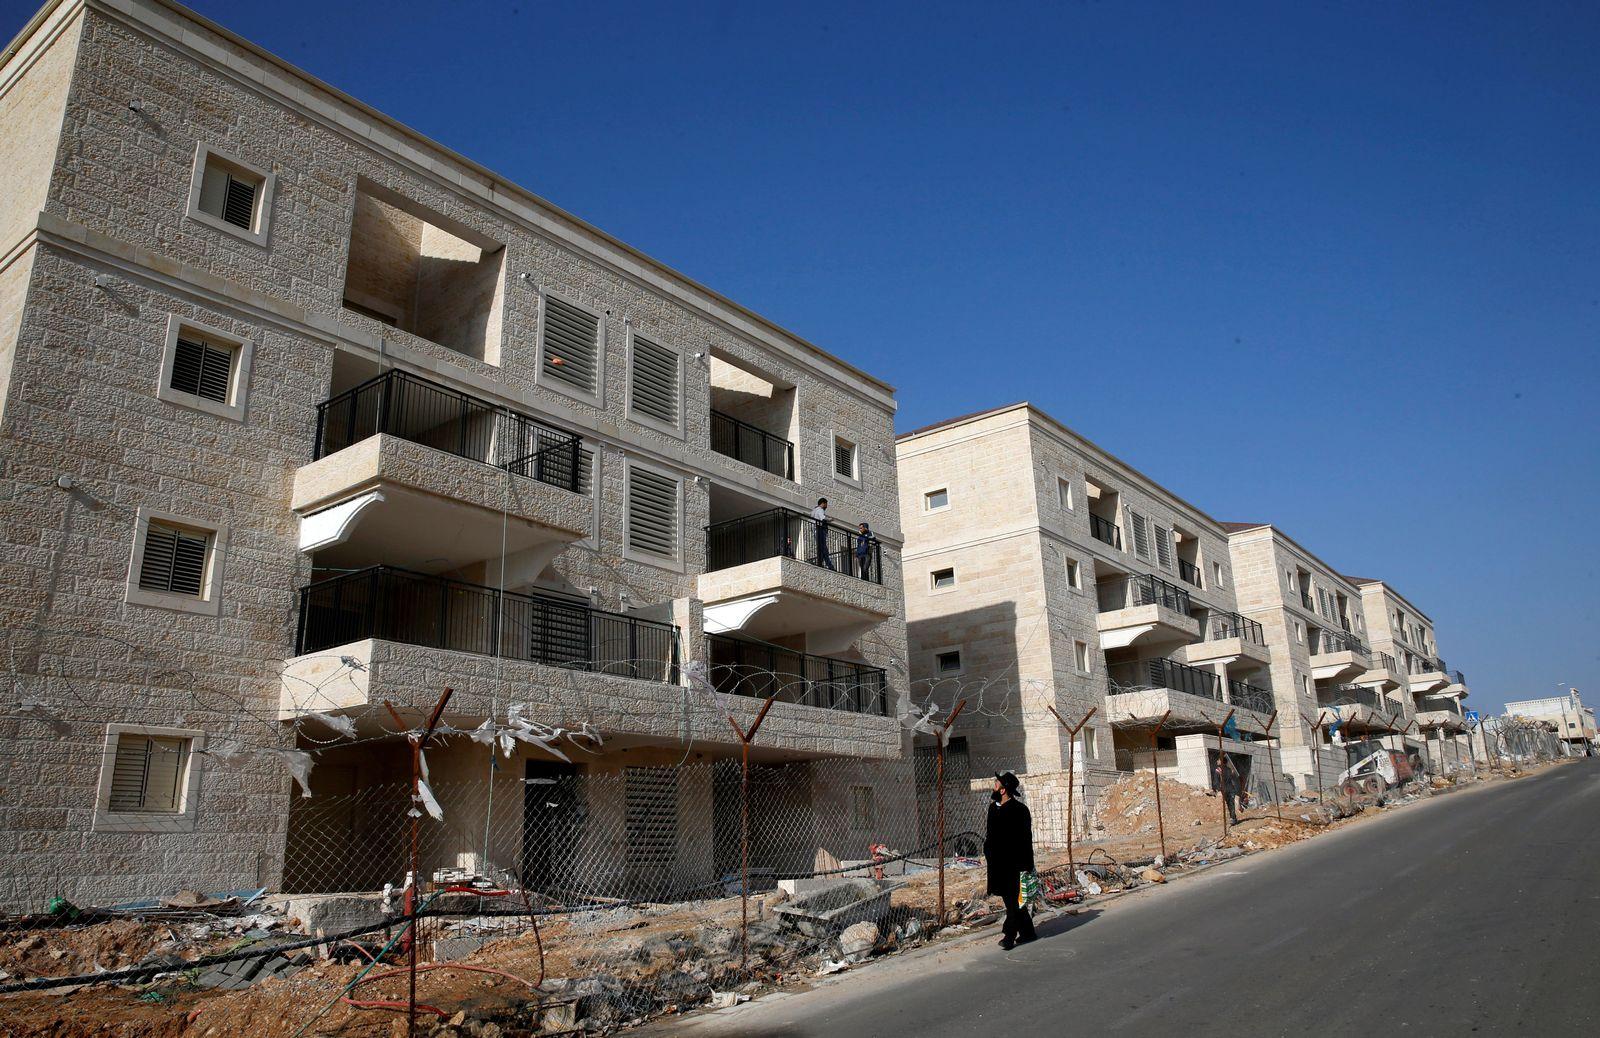 ISRAEL PALESTINA / Westjordanland/ Beitar Ilit